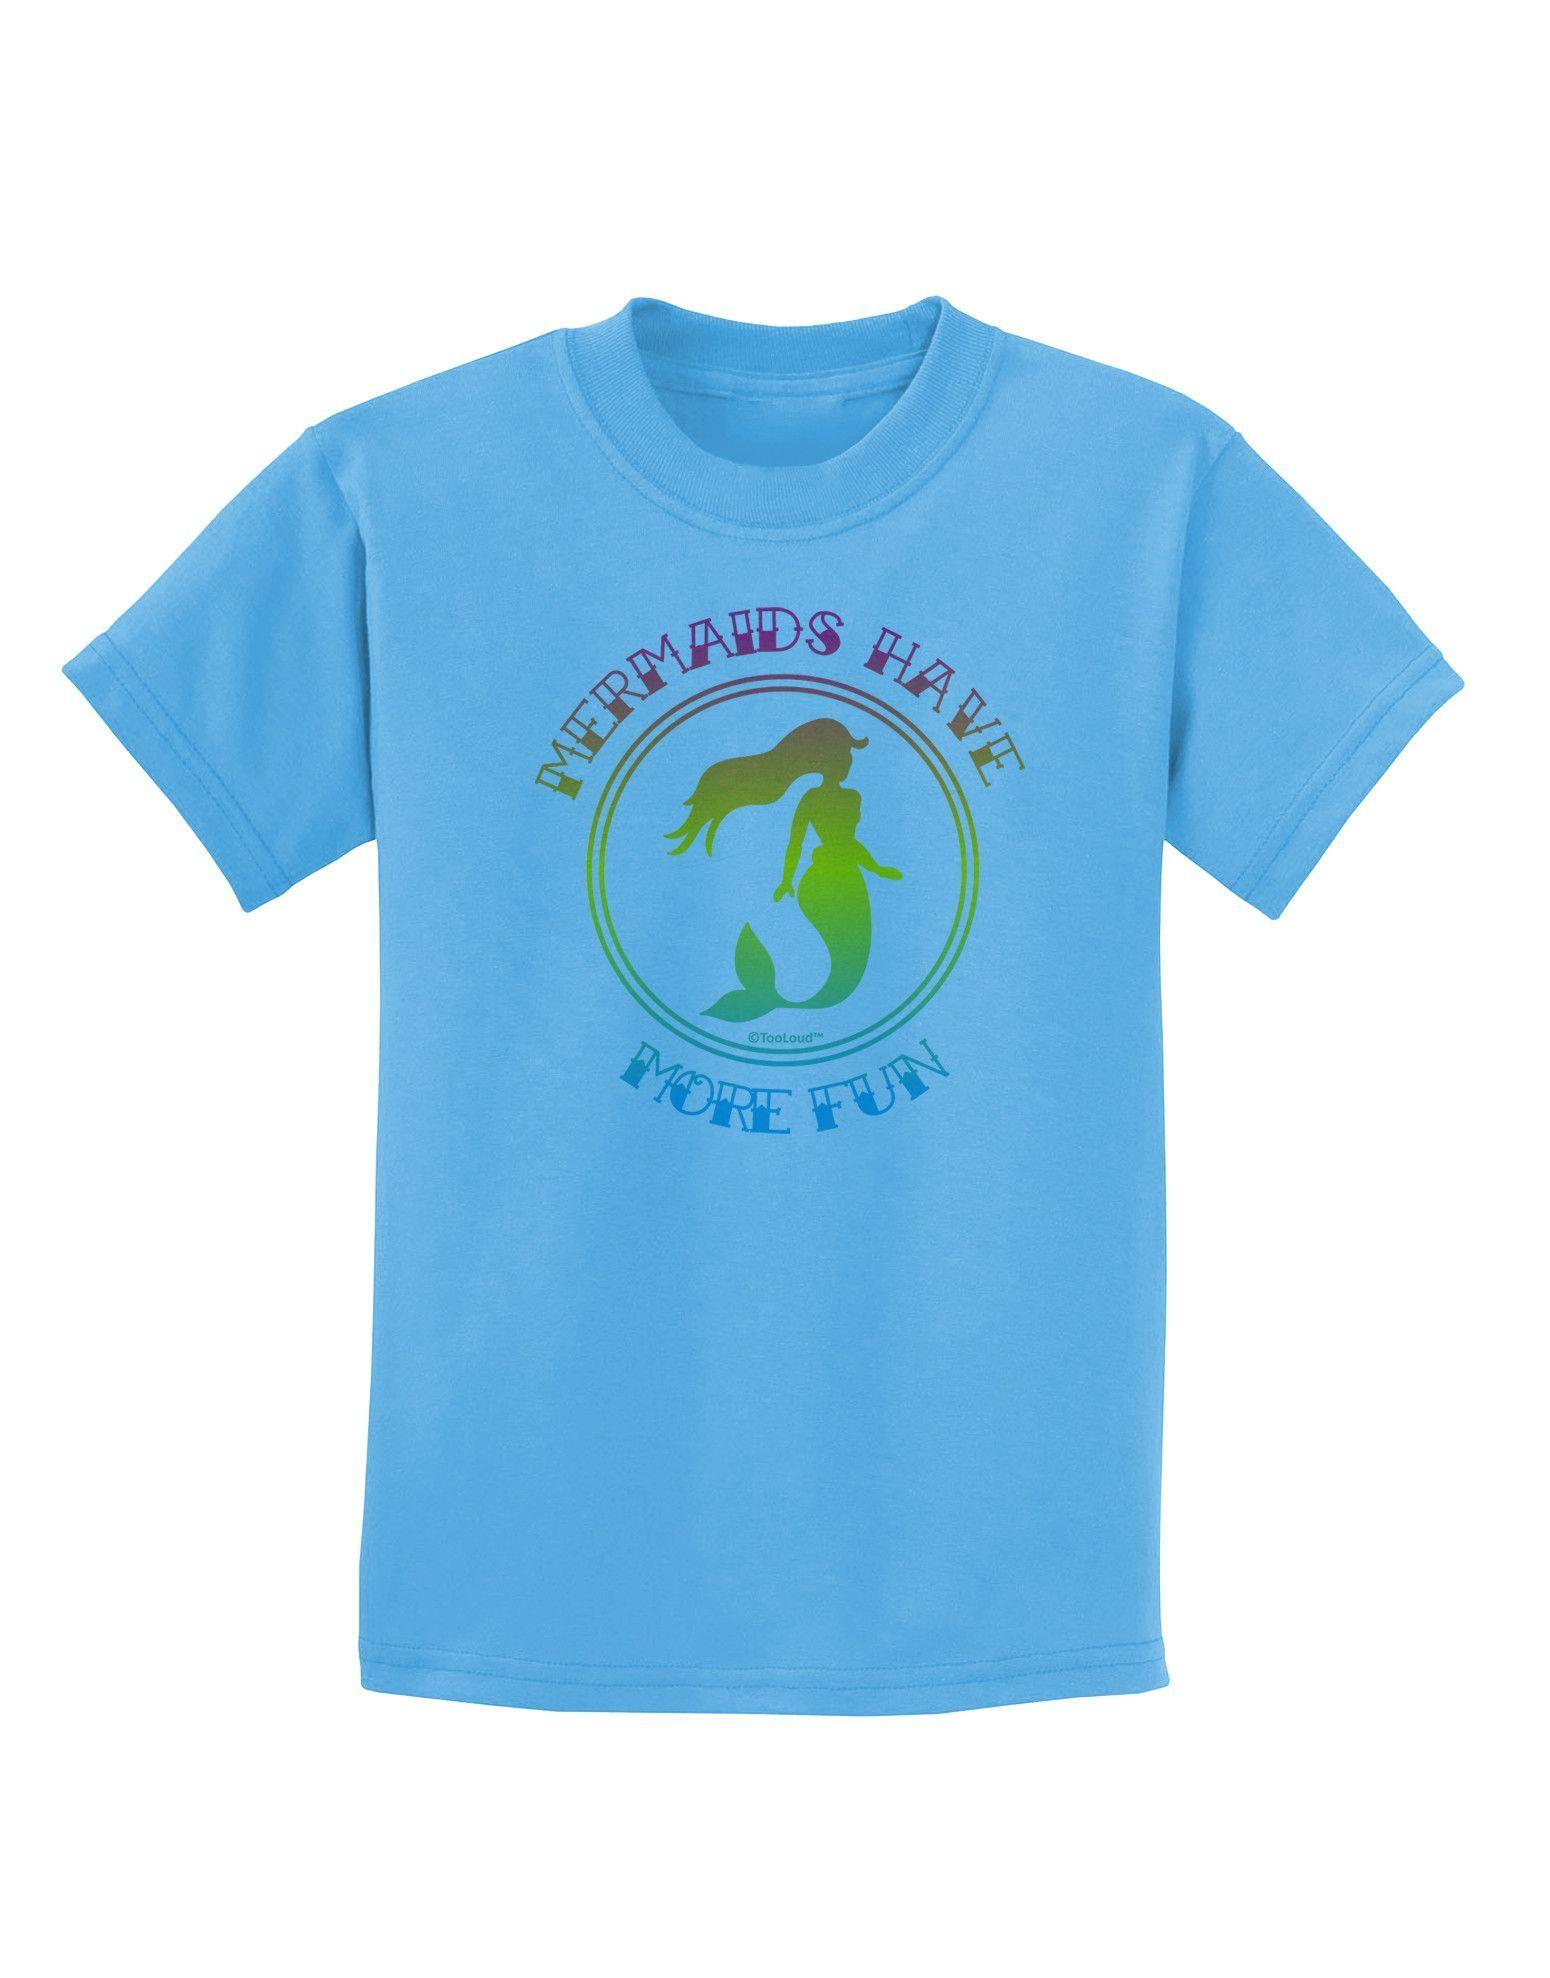 TooLoud Mermaids Have More Fun - Beachy Colors Childrens T-Shirt